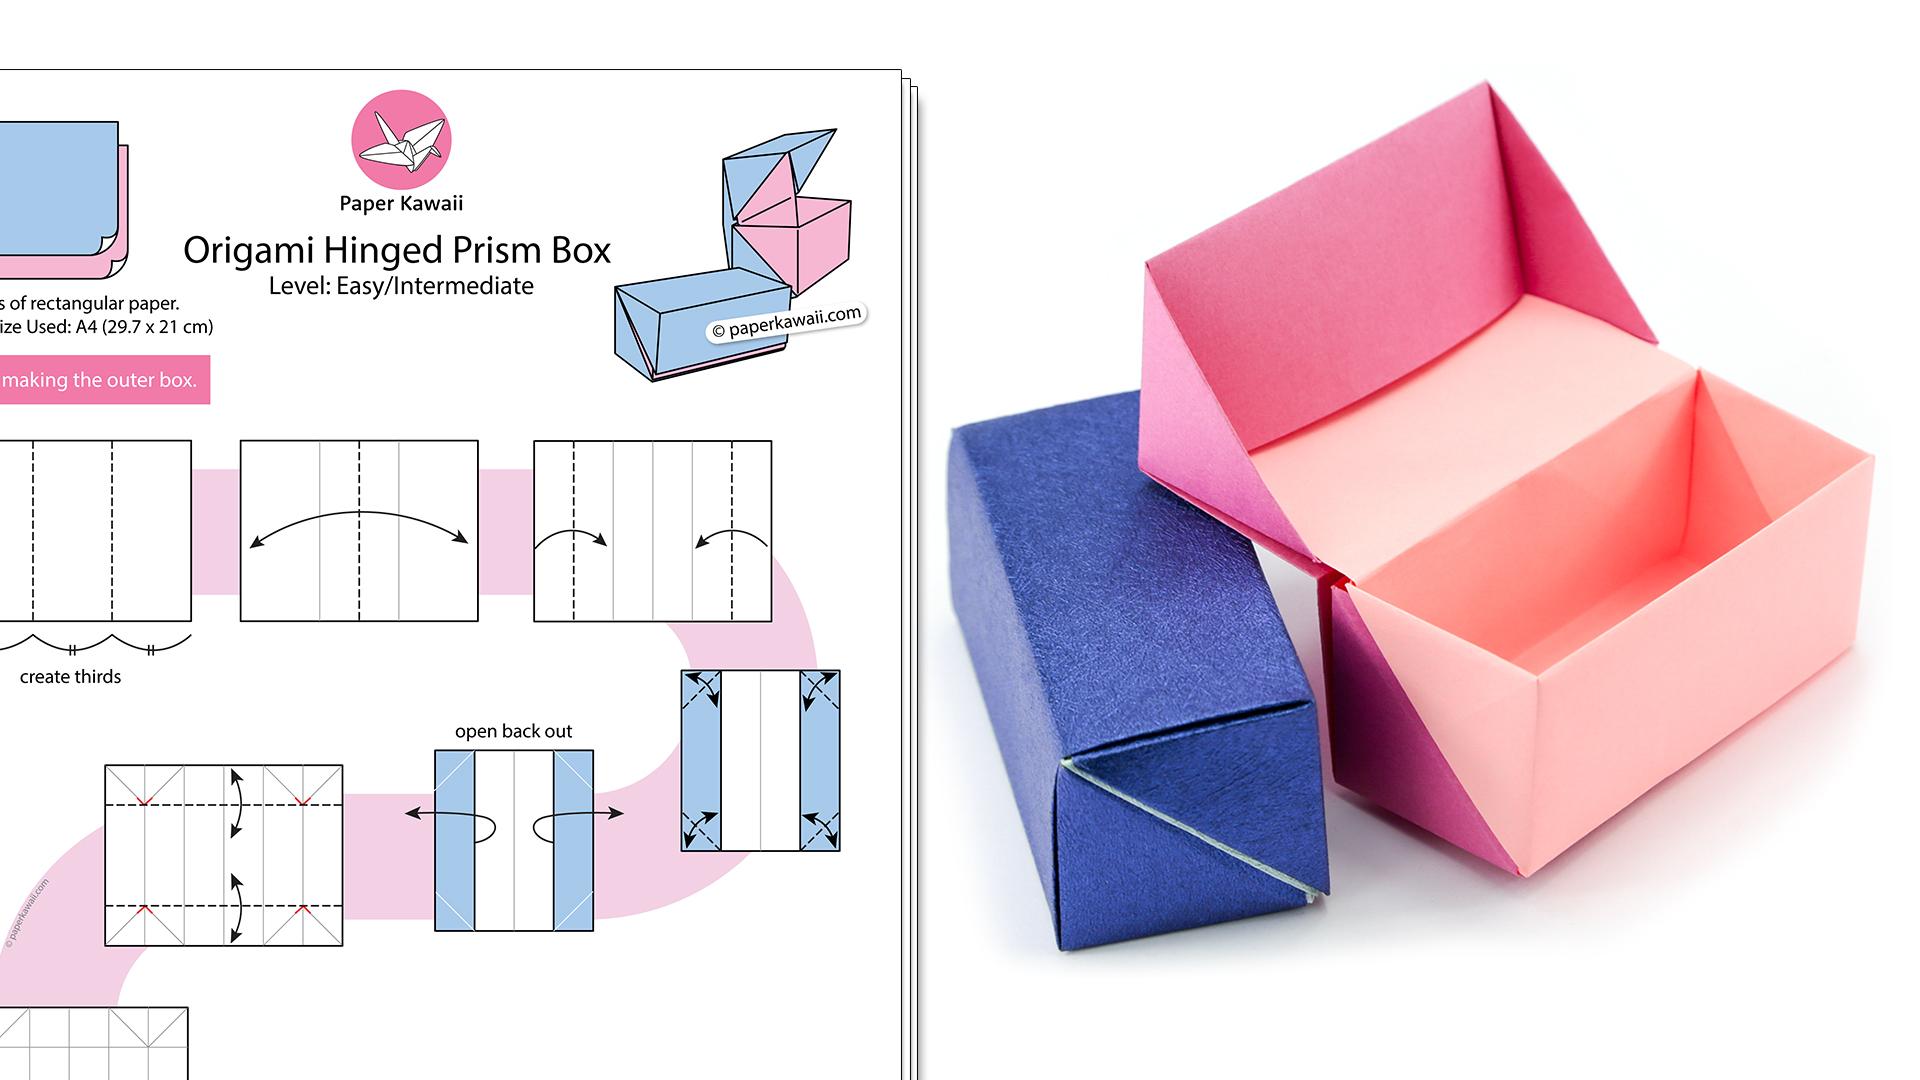 Origami Hinged Prism Gift Box Diagram - Paper Kawaii Shop - photo#34